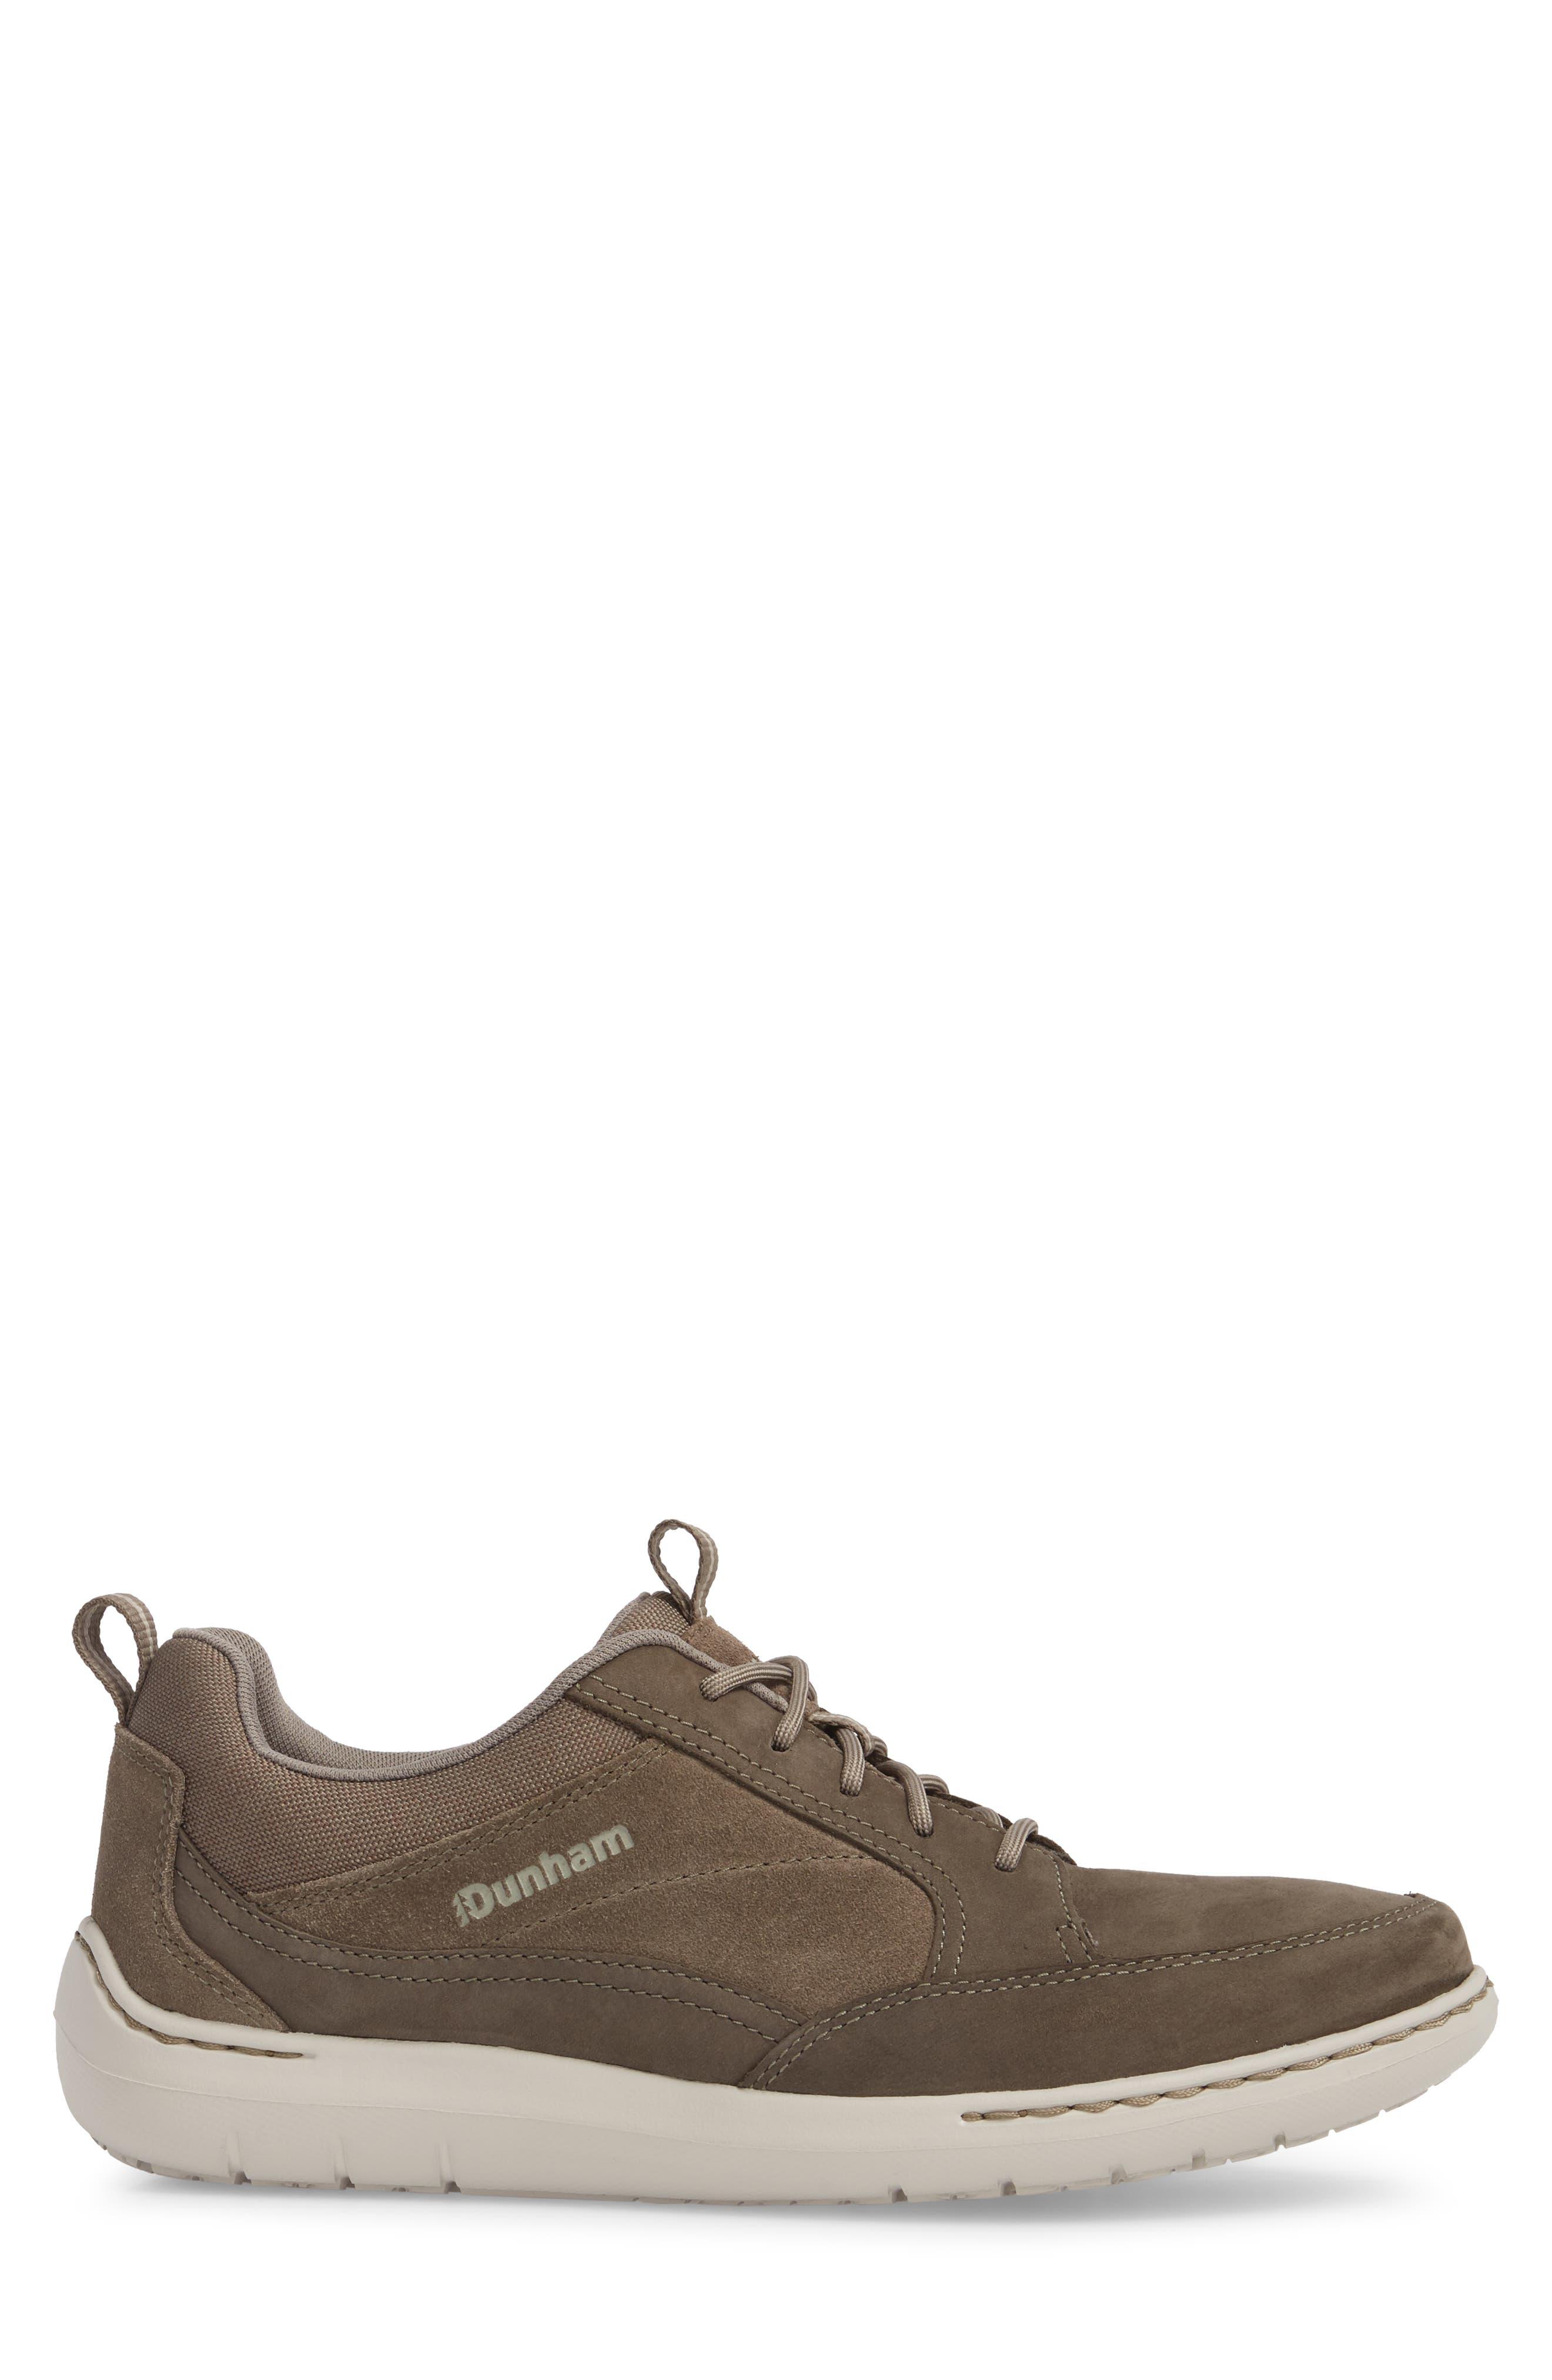 DUNHAM, D Fit Smart Sneaker, Alternate thumbnail 3, color, BROWN